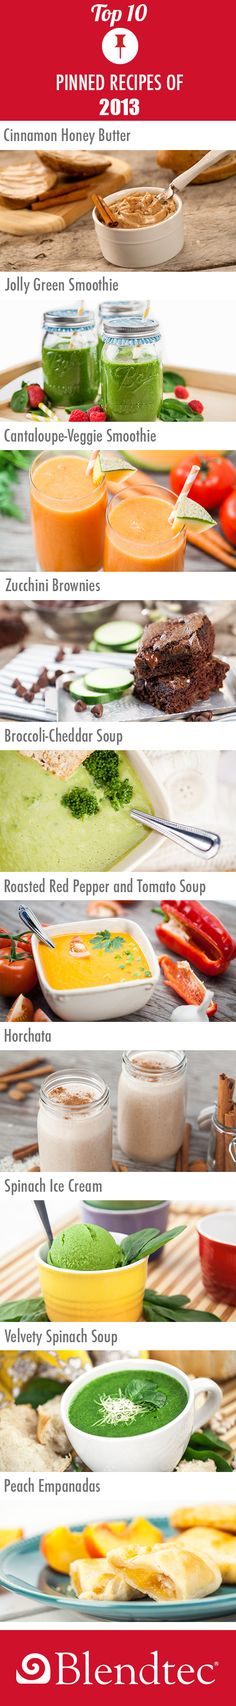 Blendtec's Top 10 Pinned Recipes of 2013 - Paleo Healthy Blender Recipes, Yummy Smoothie Recipes, Healthy Juices, Vegetarian Recipes, Gluten Free Drinks, Incredible Edibles, Healthy Shakes, Fabulous Foods, Blendtec Recipe